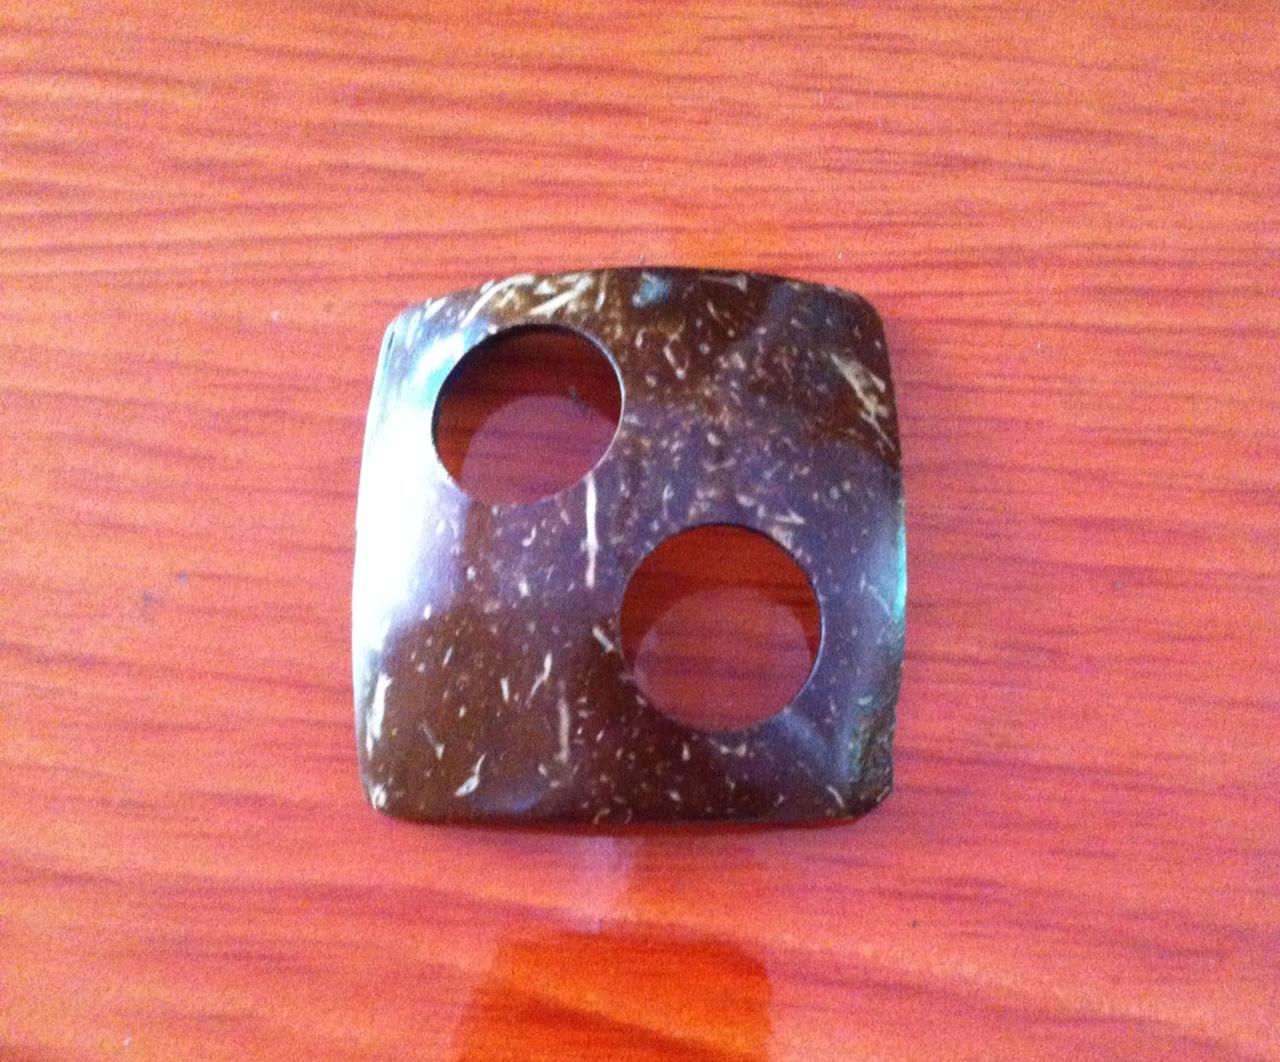 Coconut Buckle (Square) (หัวเข็มขัดกะลามะพร้าวรูปสี่เหลี่ยมด้านเท่า สี่เหลี่ยมขนมเปียกปูน)